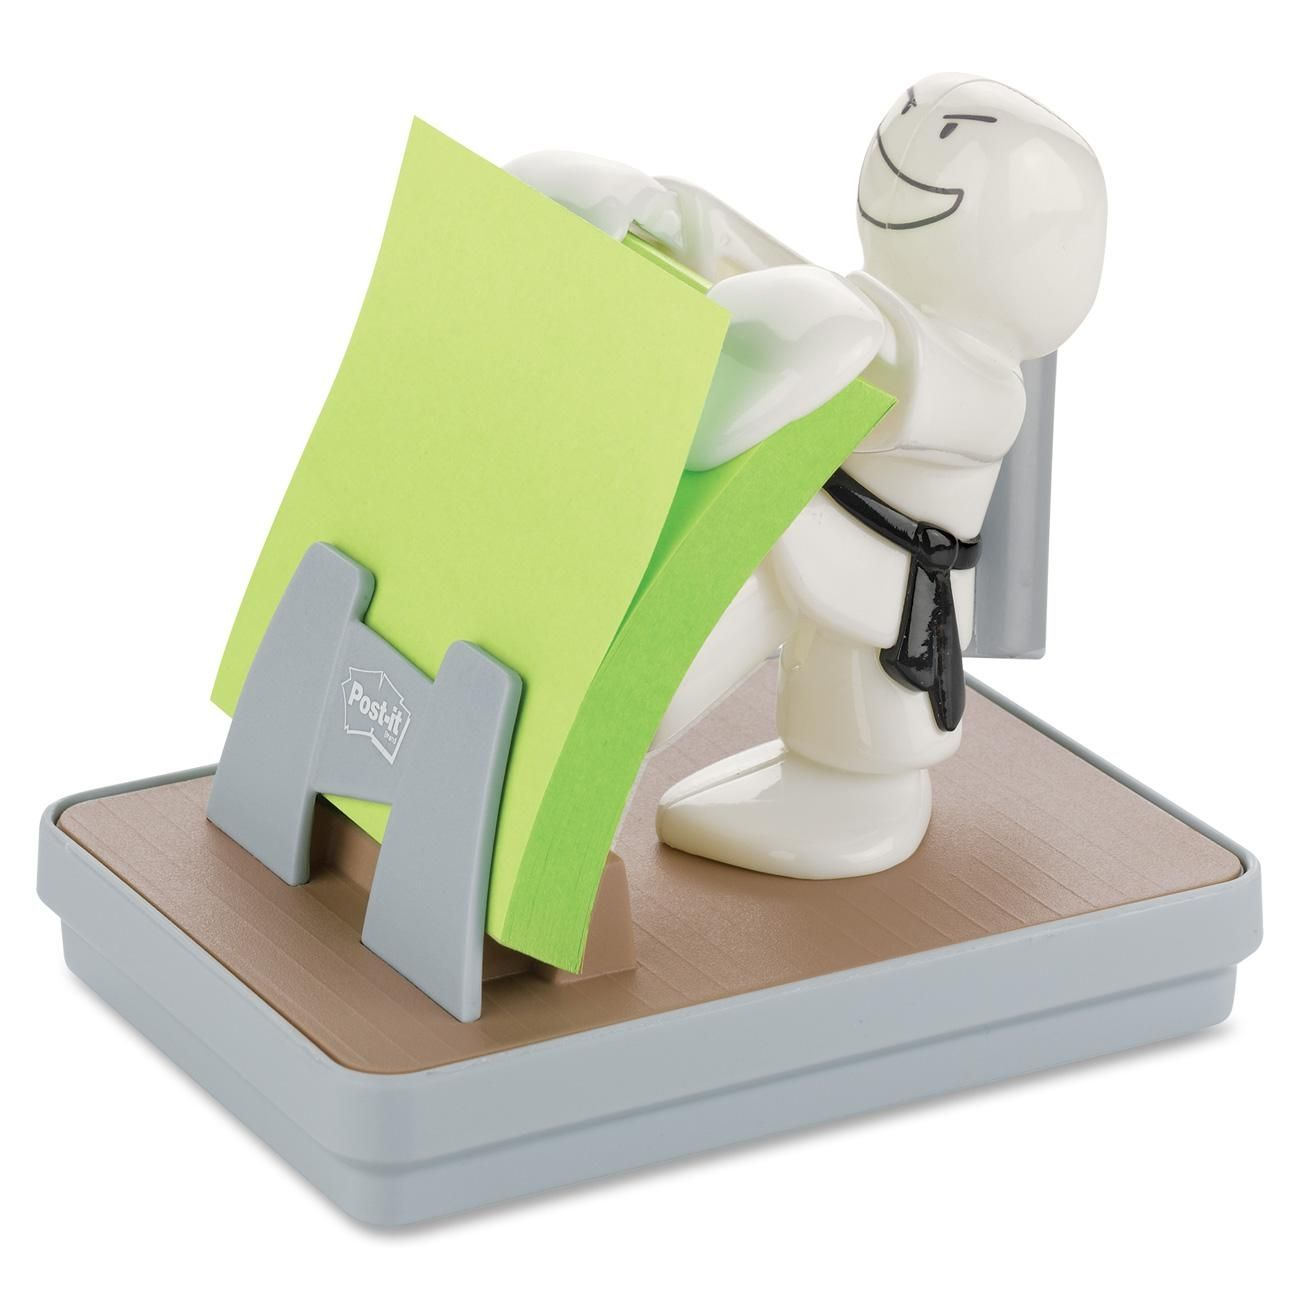 Post-it Pop-up Notes Dispenser Black Purse W Sheets Cute Desk Office Accessories